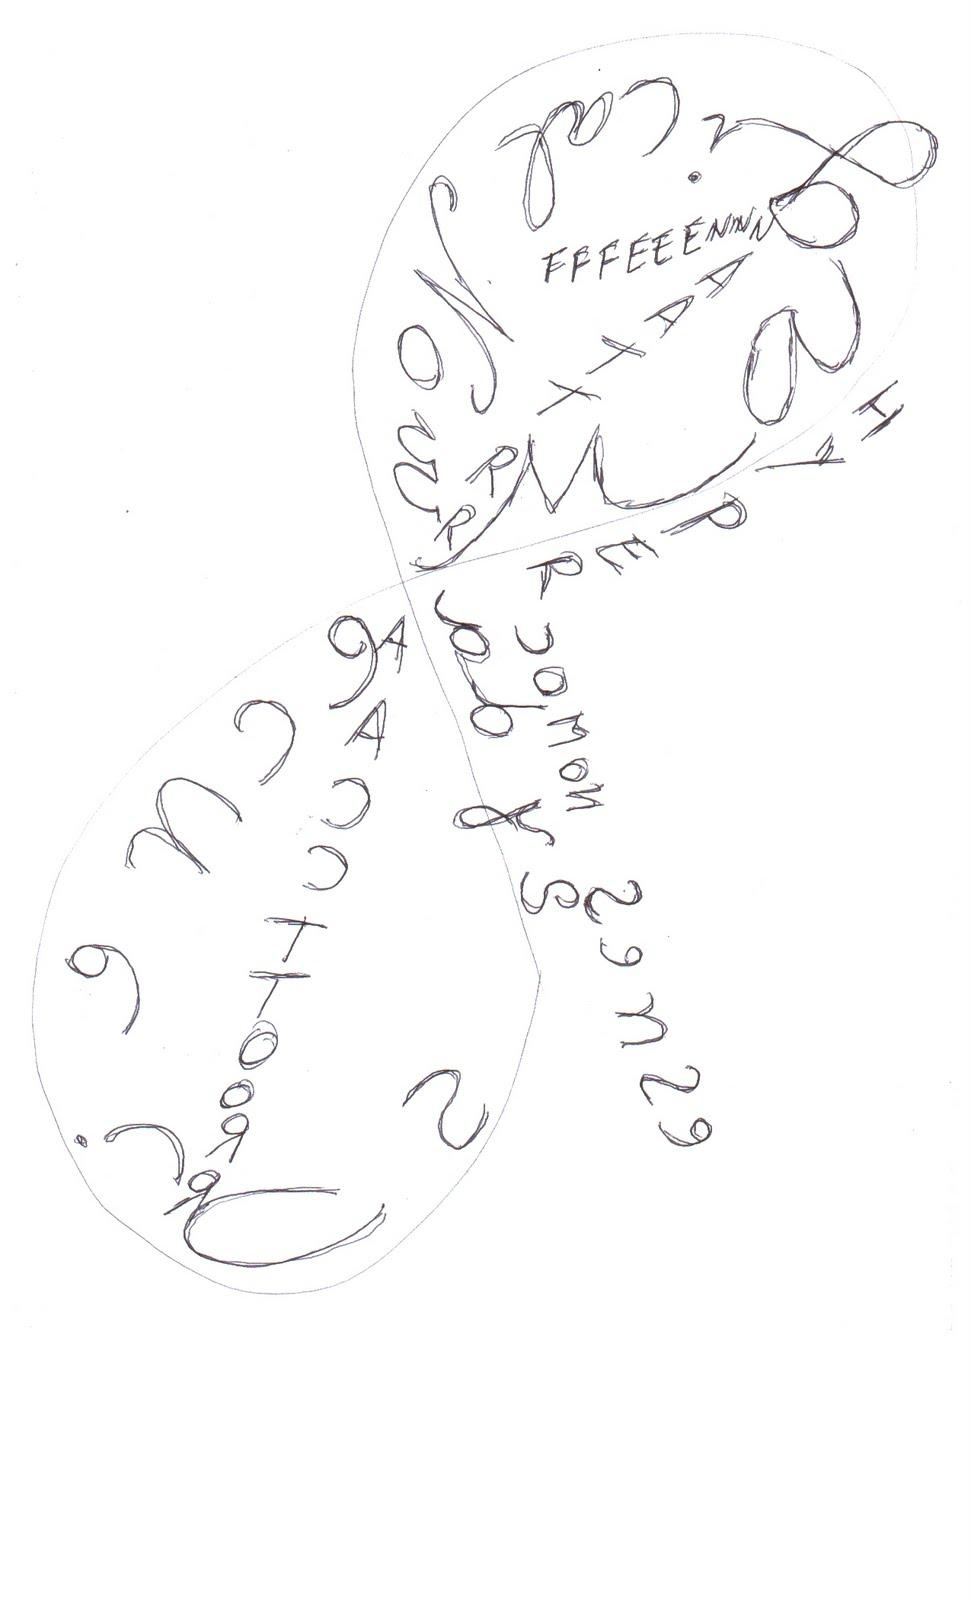 Moebius Artext (reversing below)